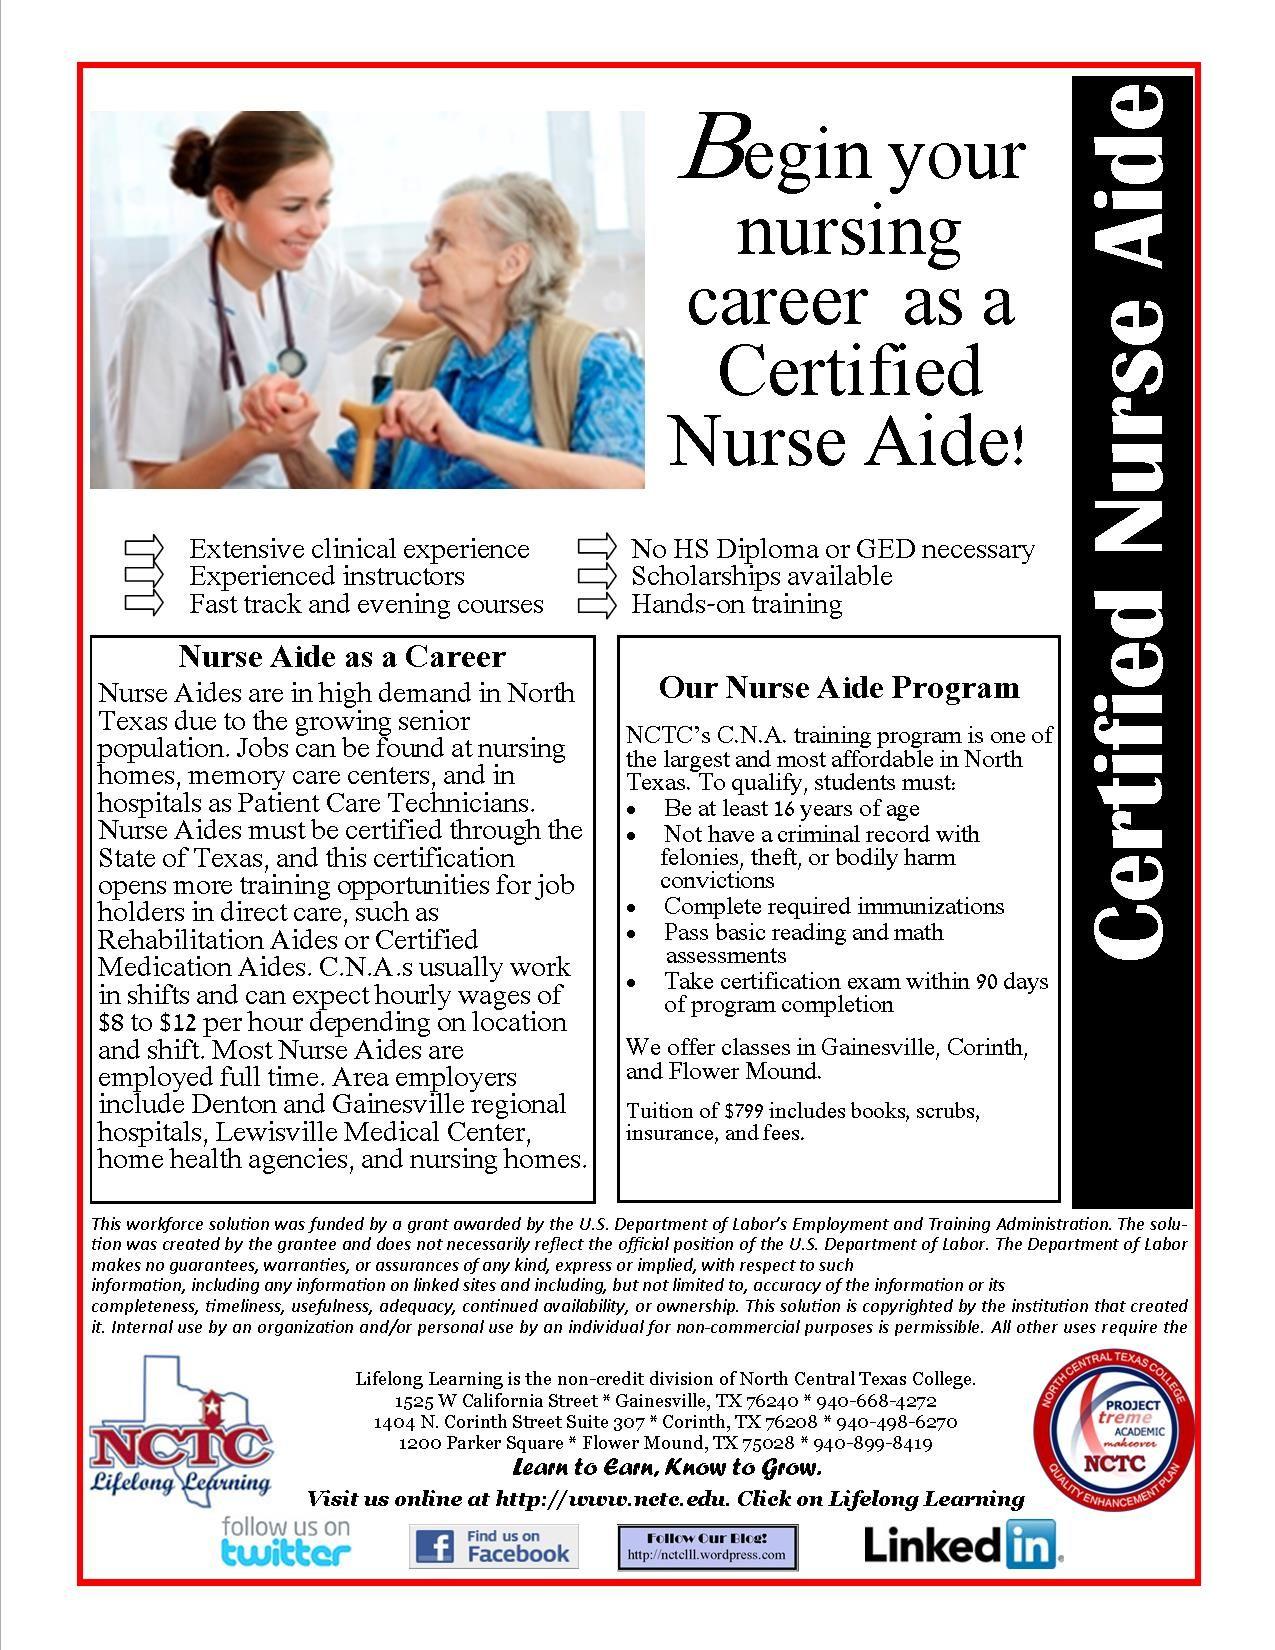 Check out our cna program httpnctclifelonglearning check out our cna program httpnctc certified nursewebsite xflitez Choice Image